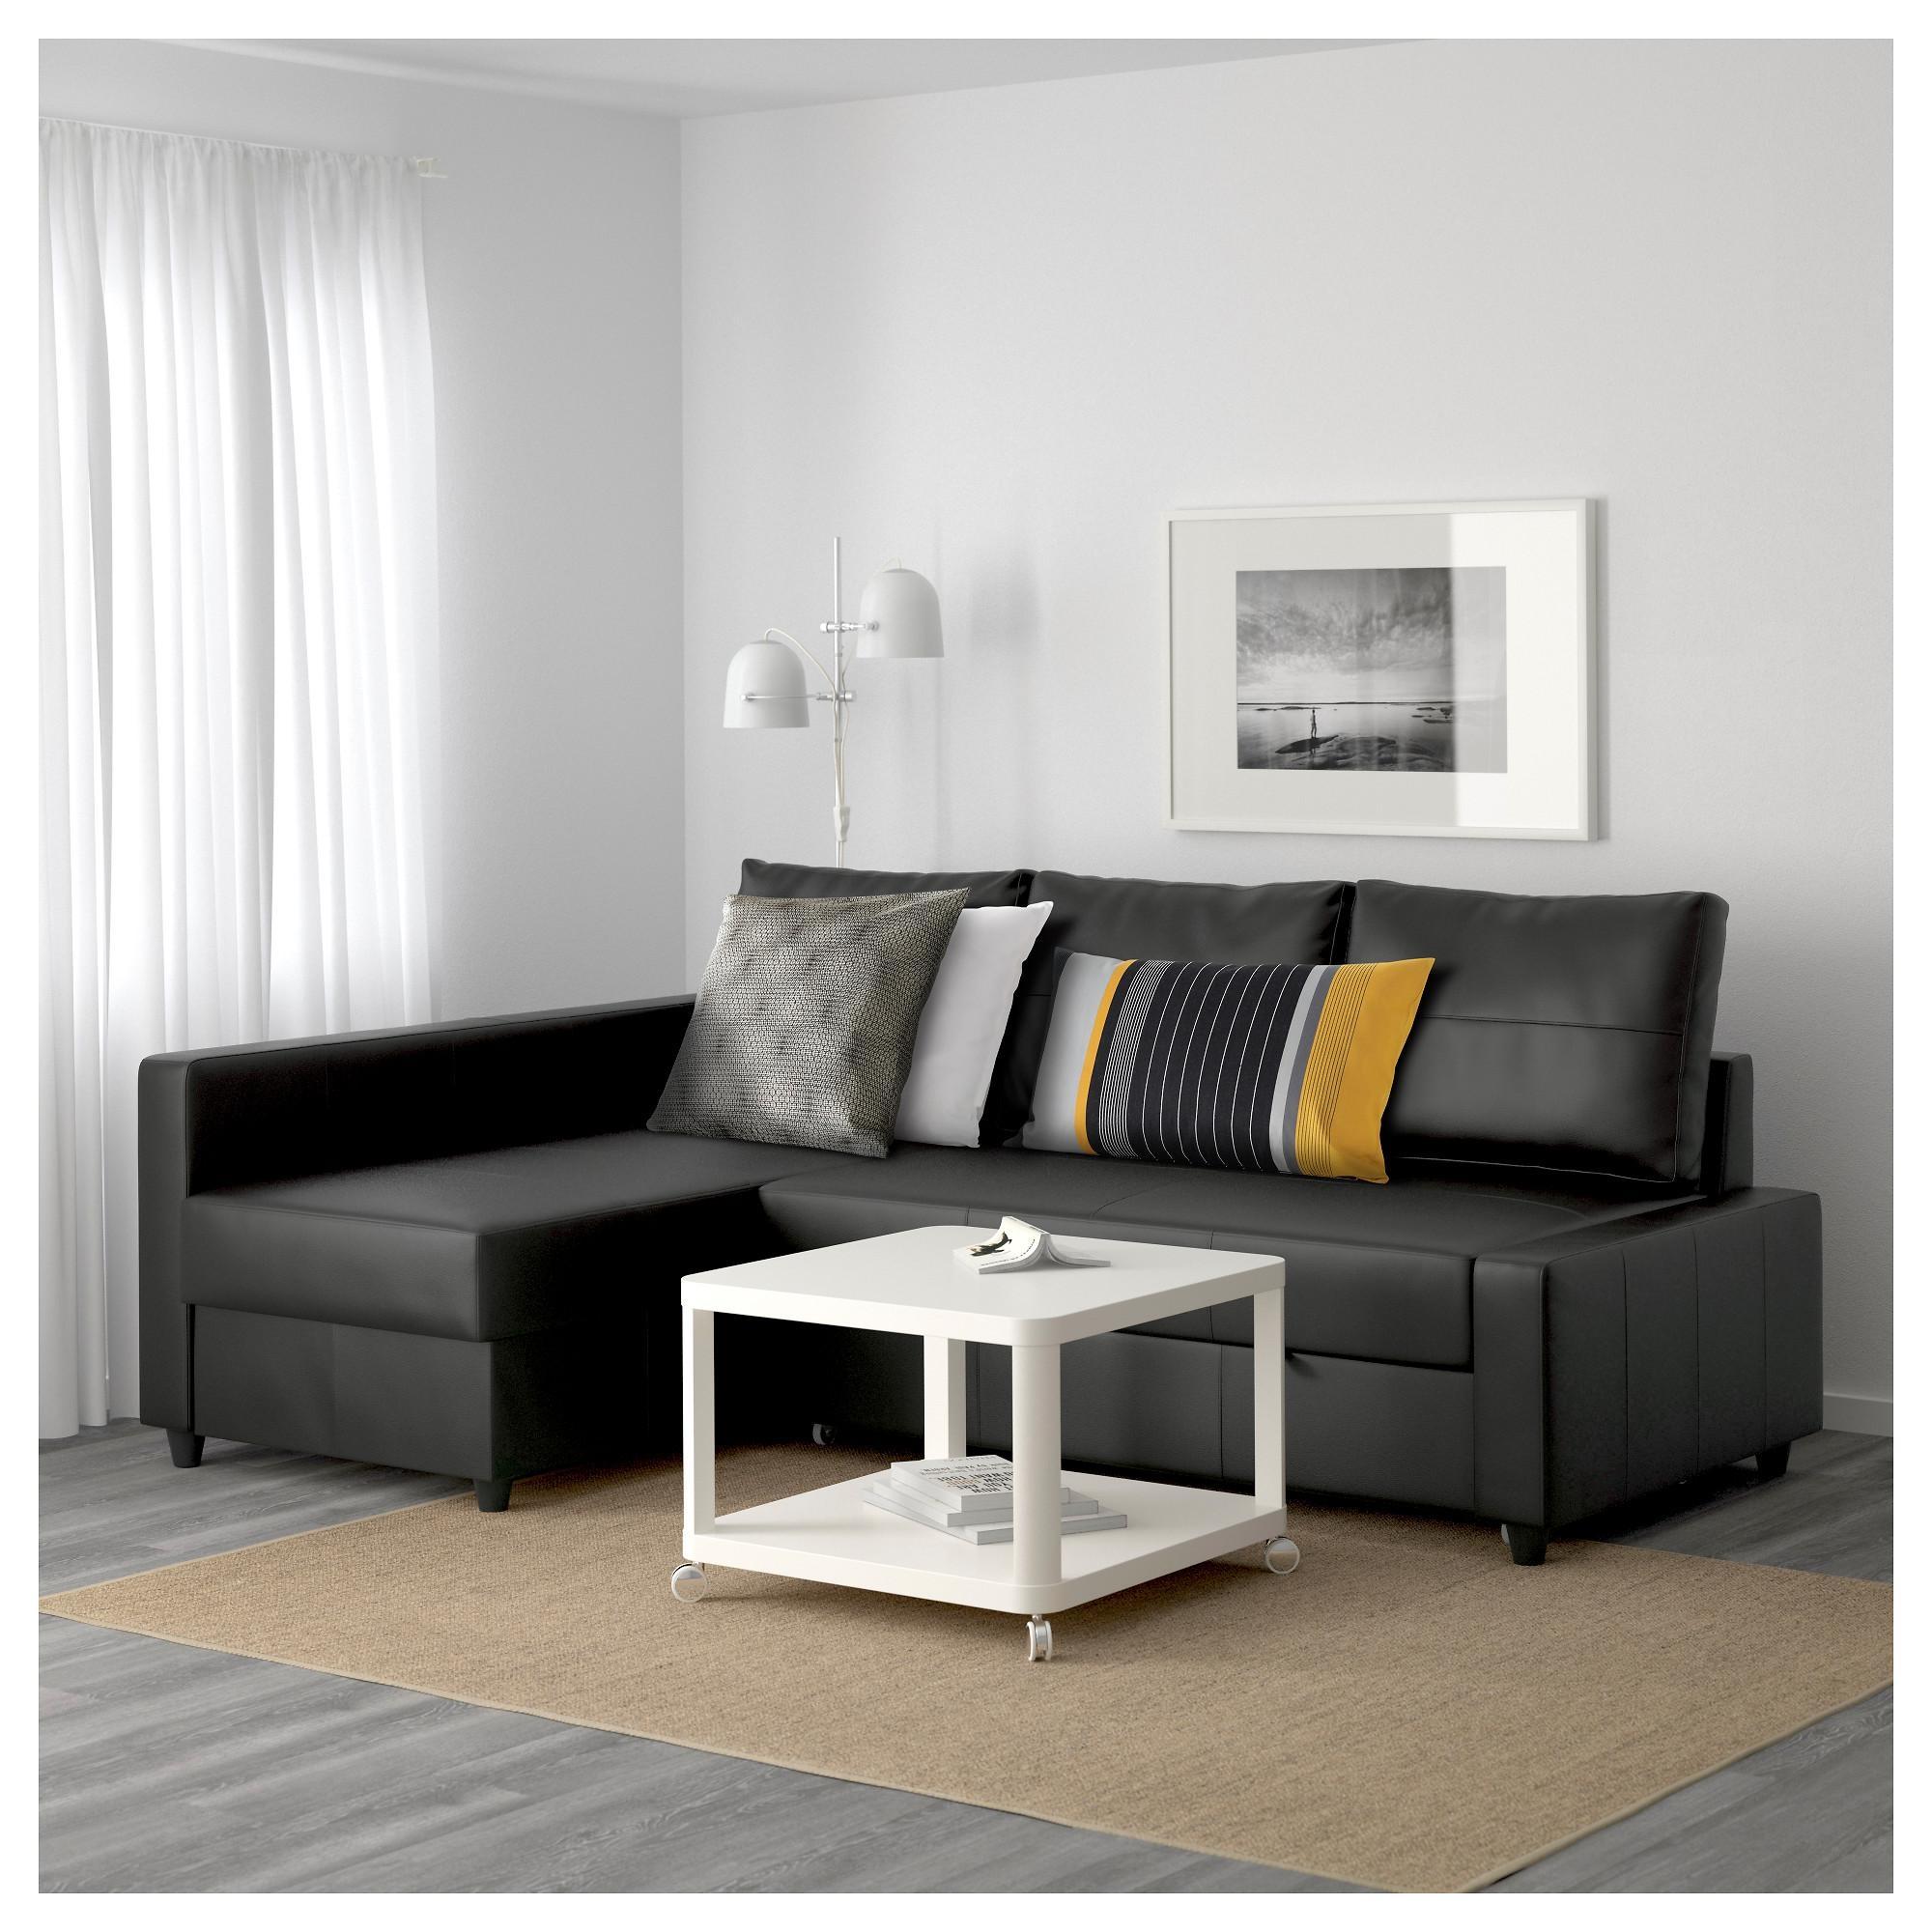 20 ideas of storage sofas ikea sofa ideas. Black Bedroom Furniture Sets. Home Design Ideas